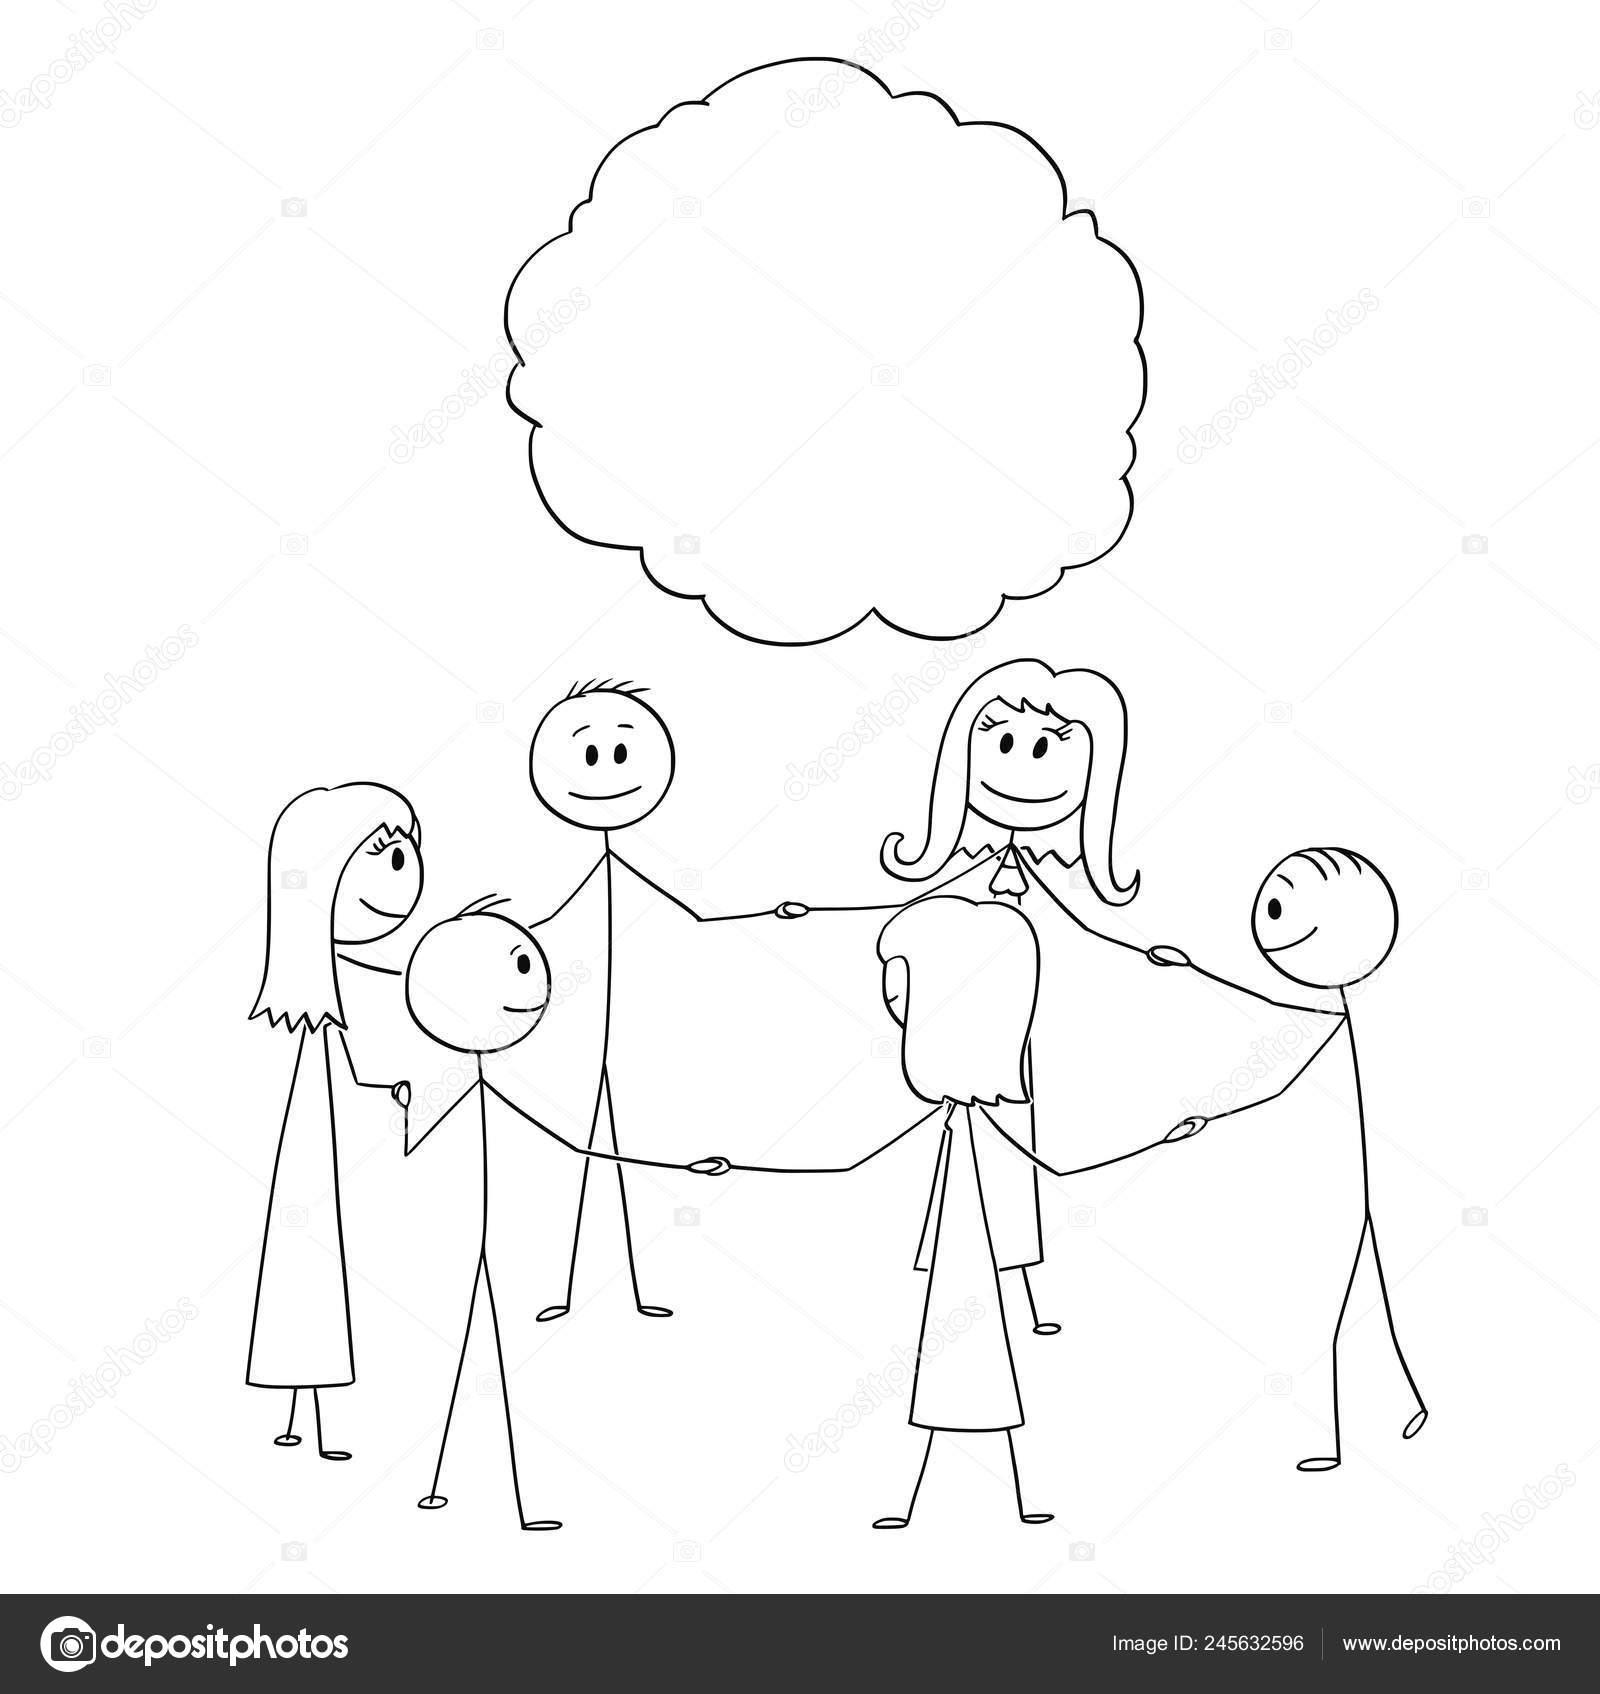 Drawings: stick figure   Cartoon Stick Figure Drawing